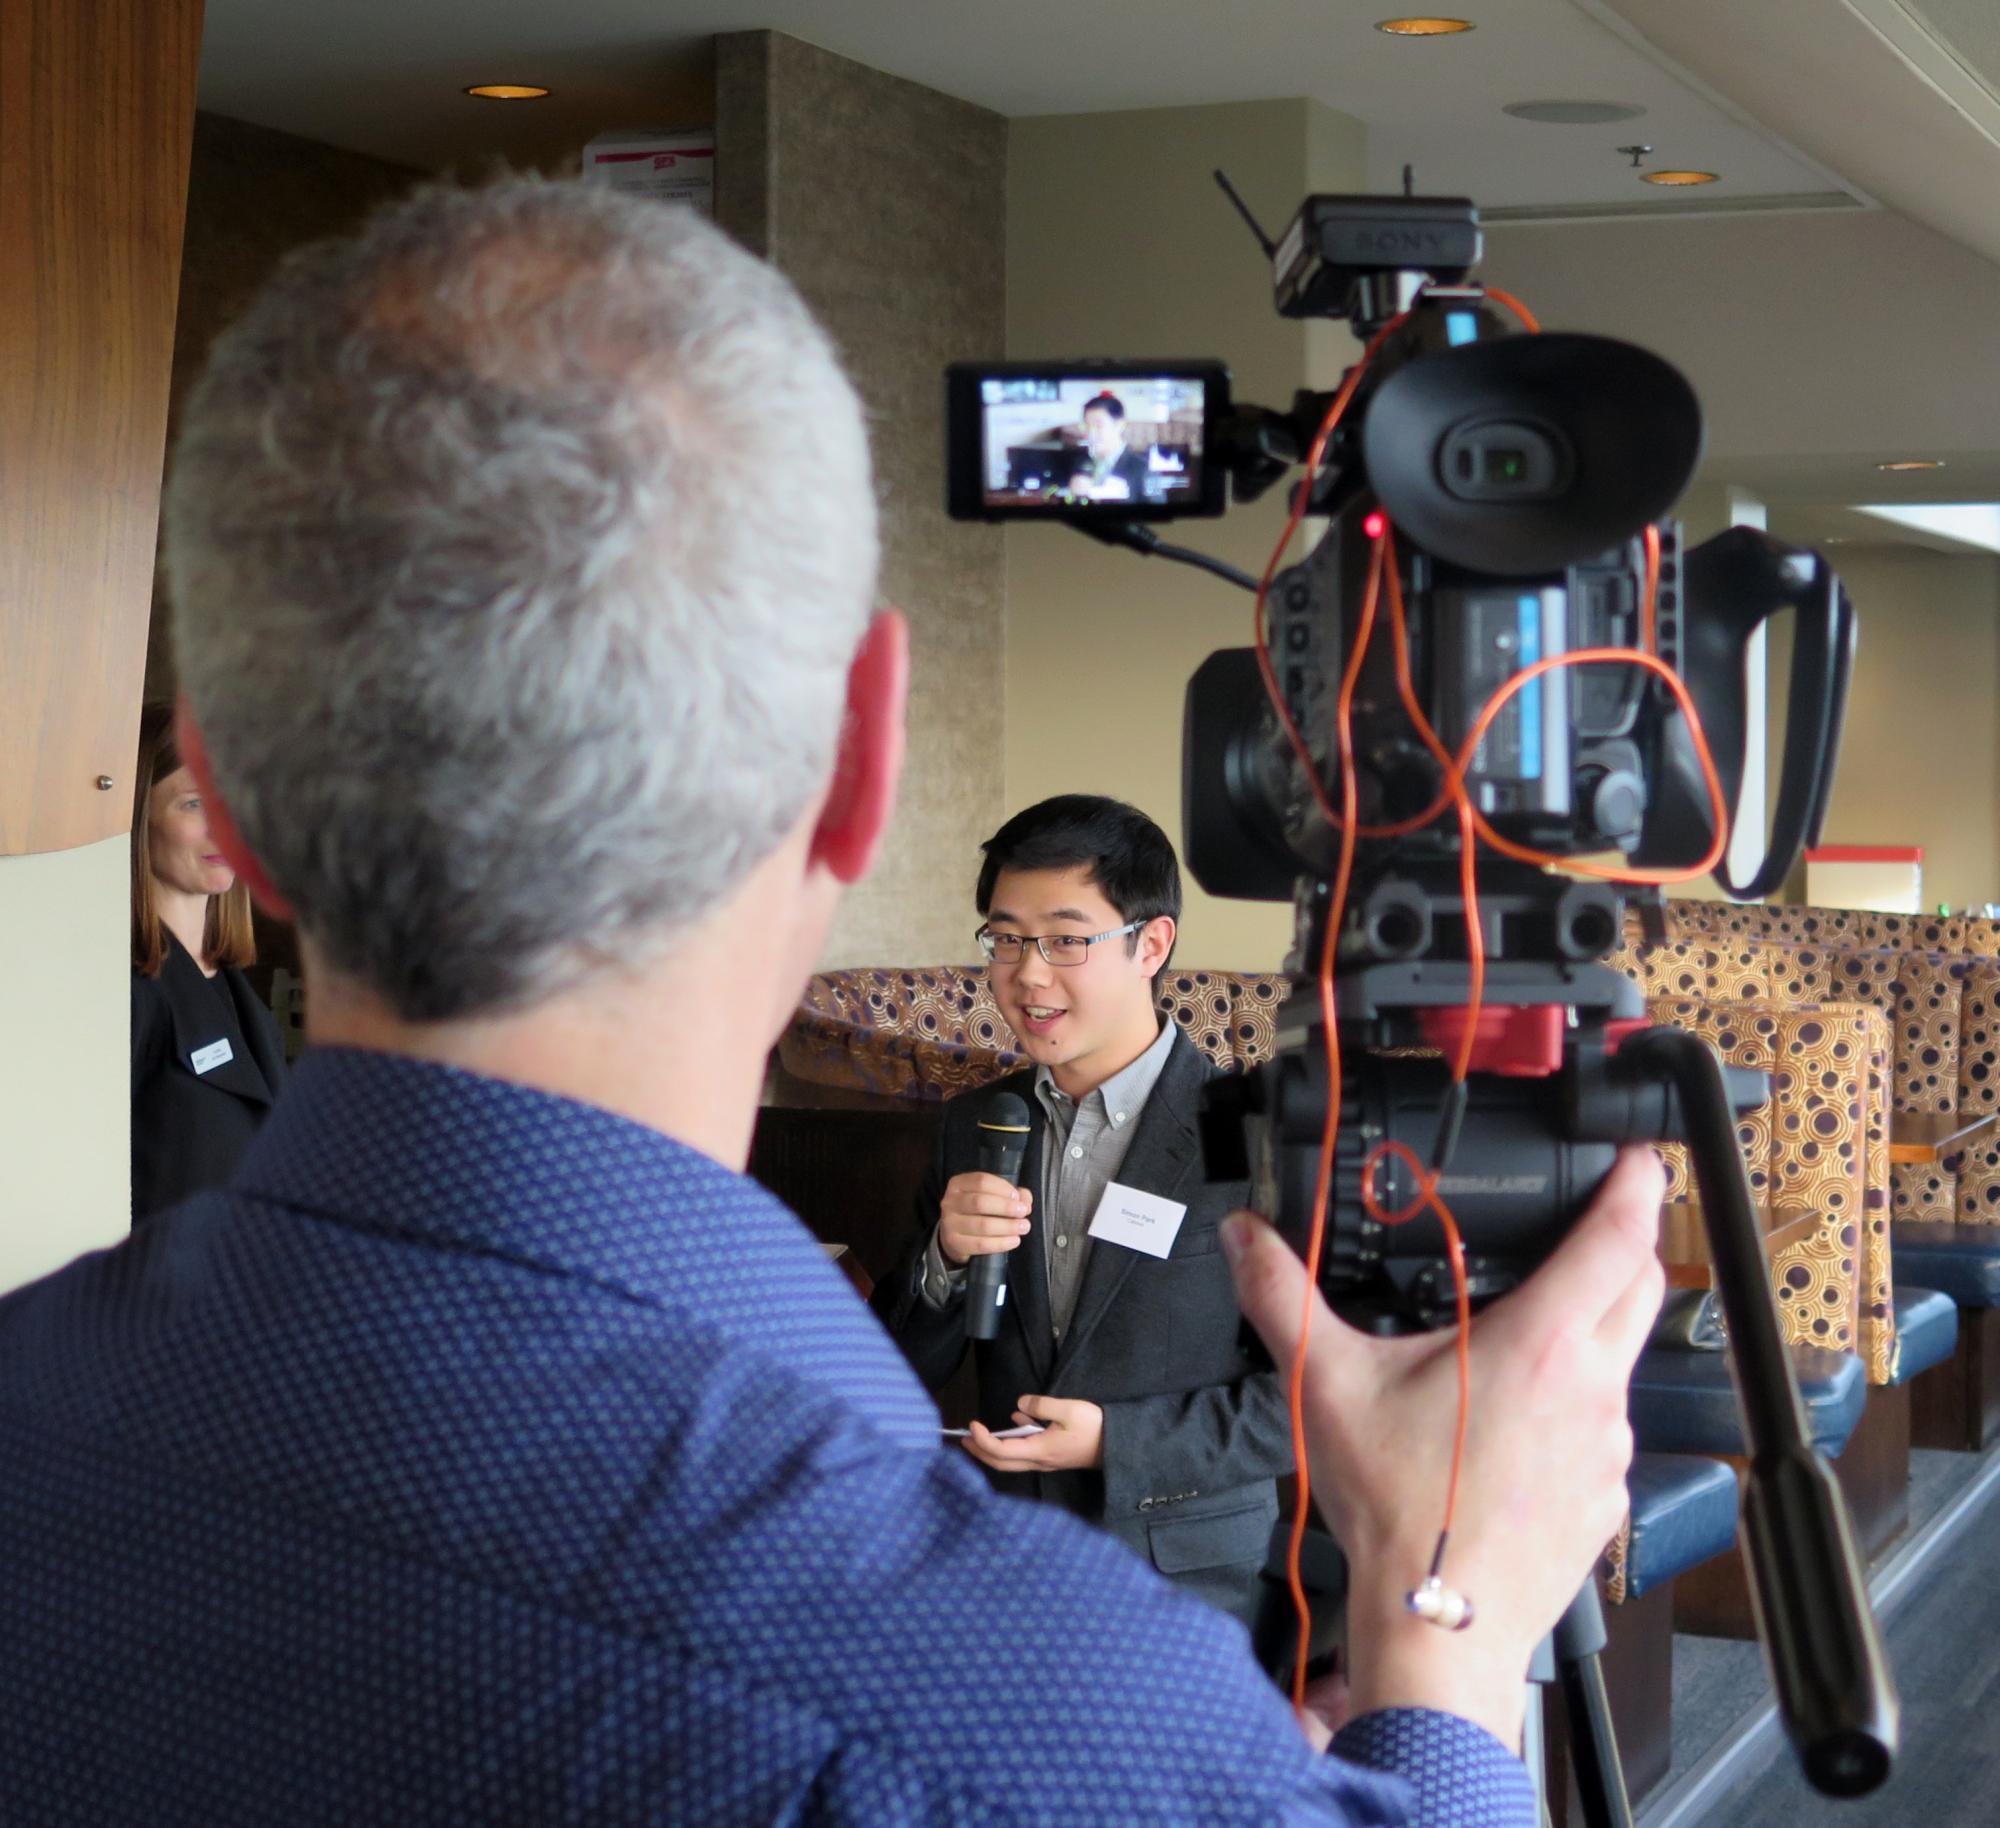 TV-Kamera mit Kameramann, im Hintergund Simon Park mit Mikrofon